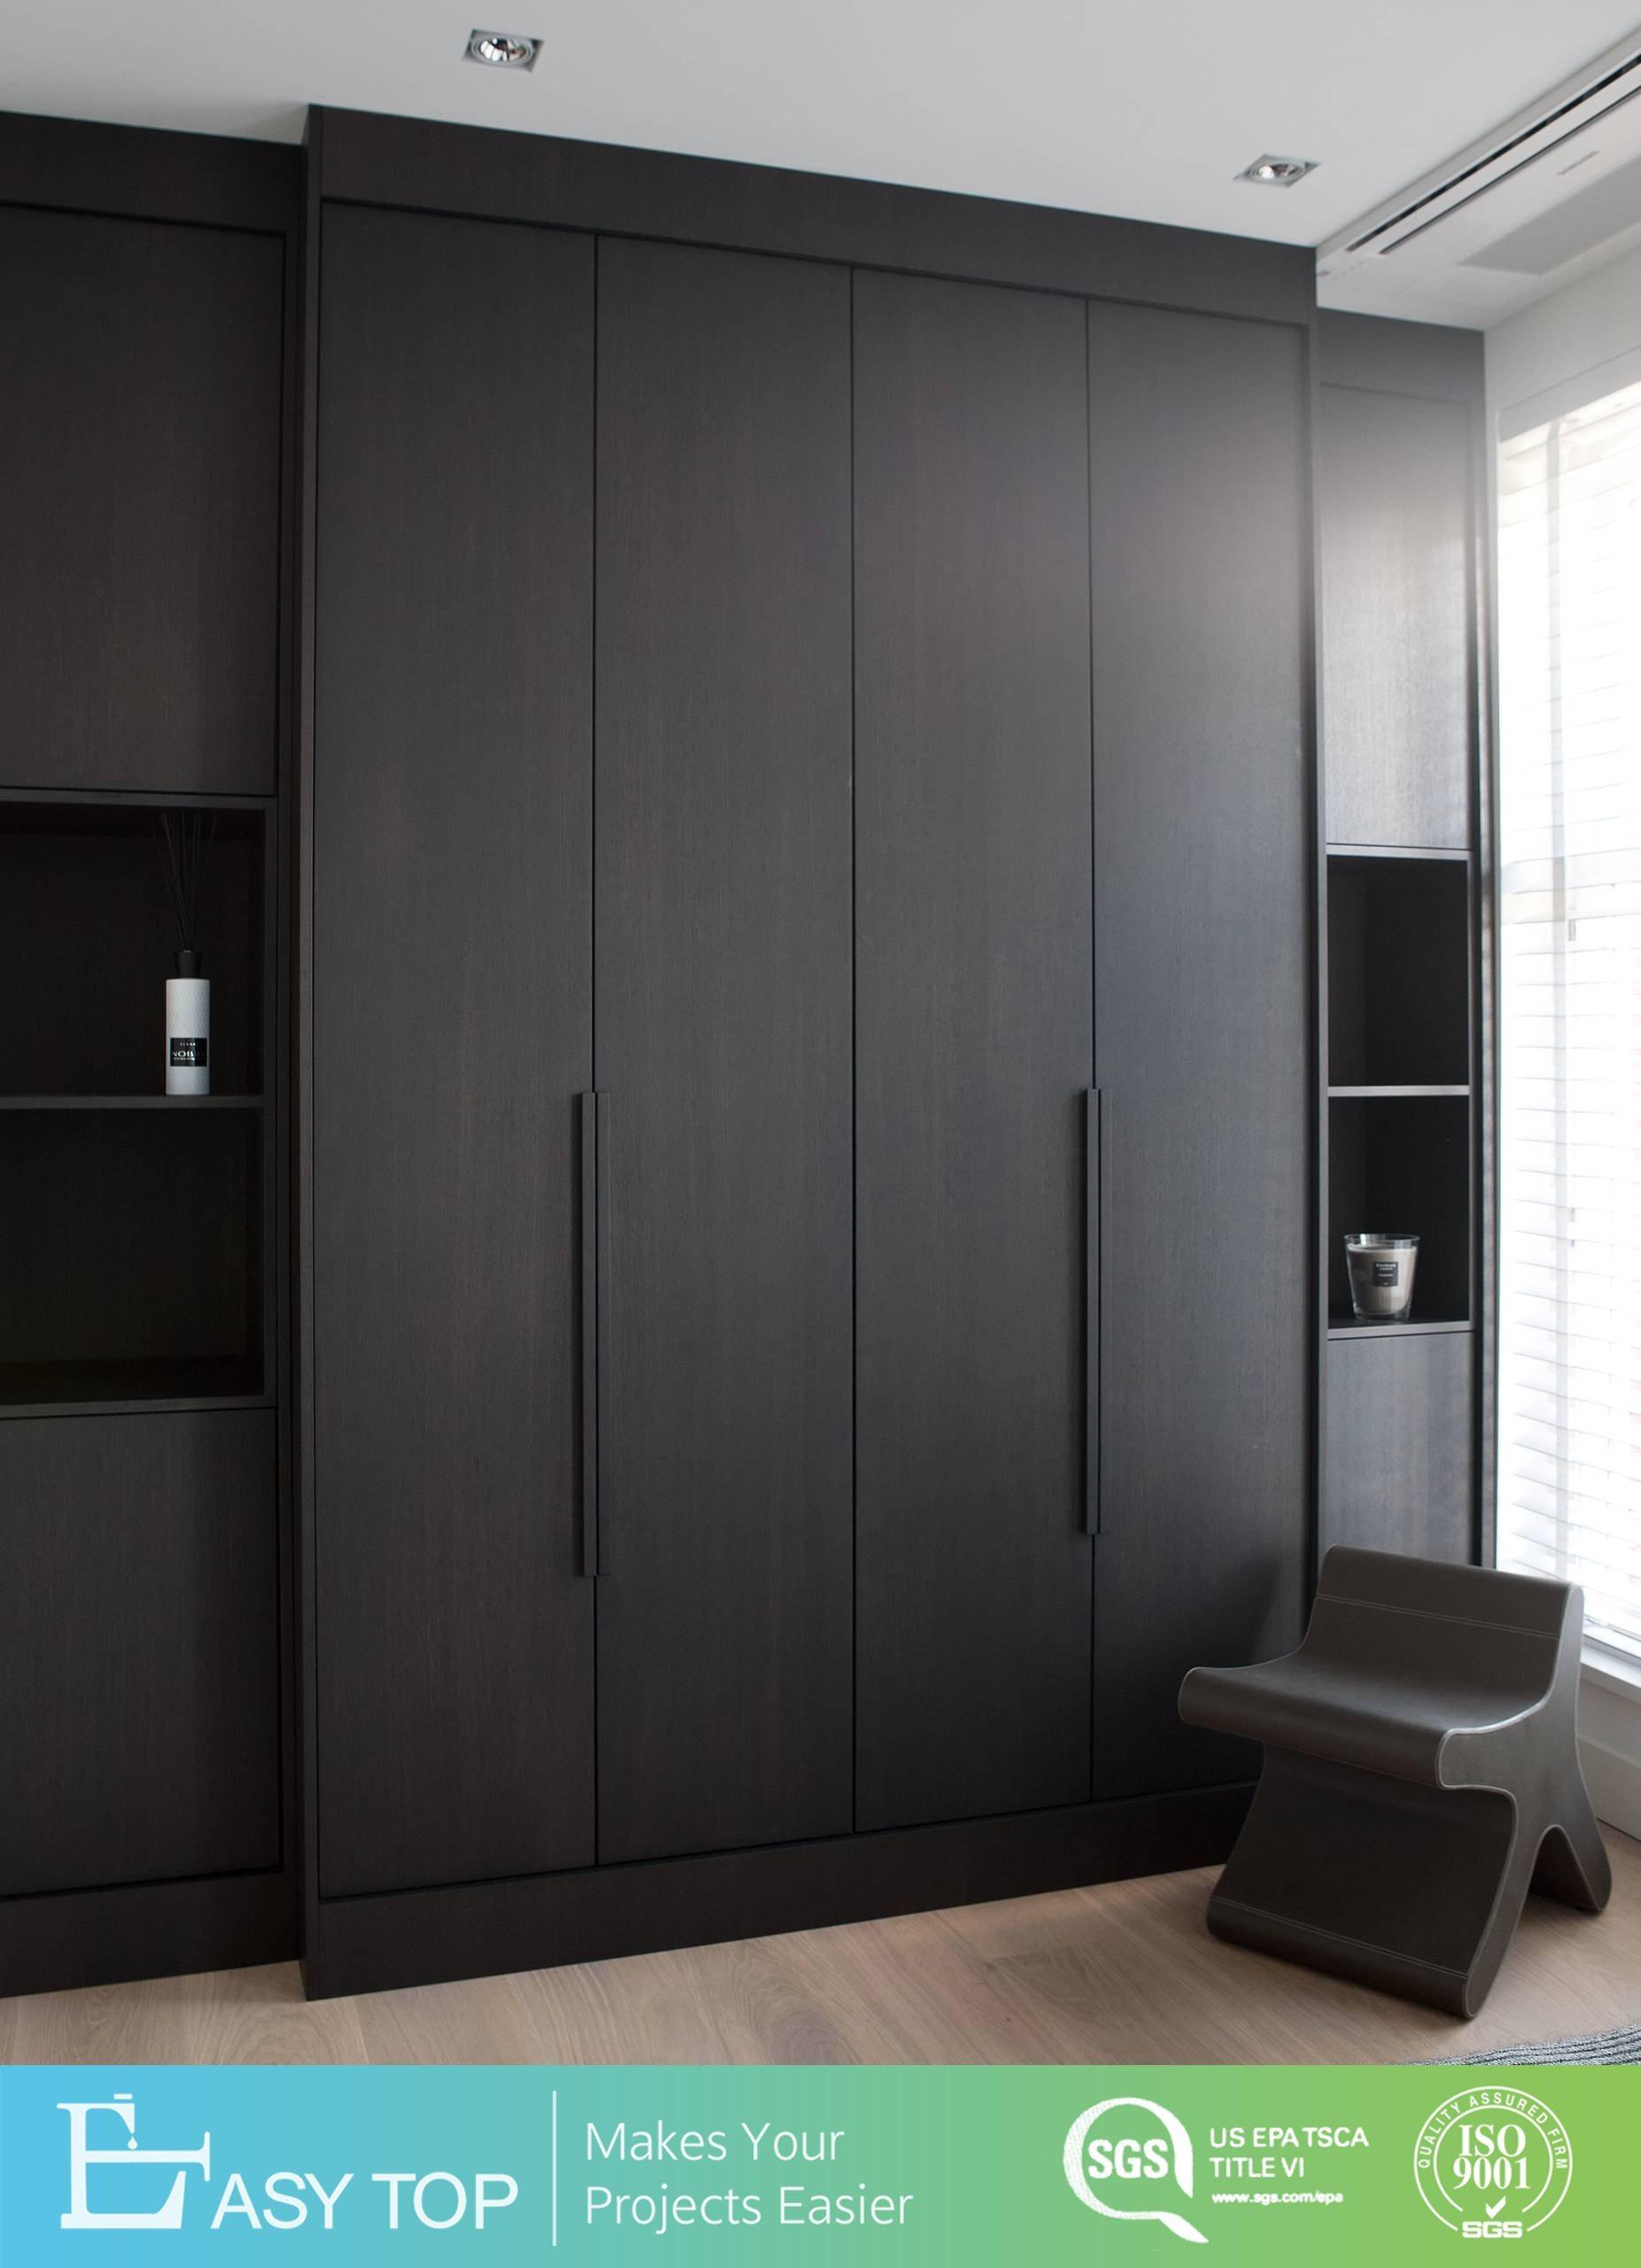 Almirah Designs For Bedroom House Decor Interior